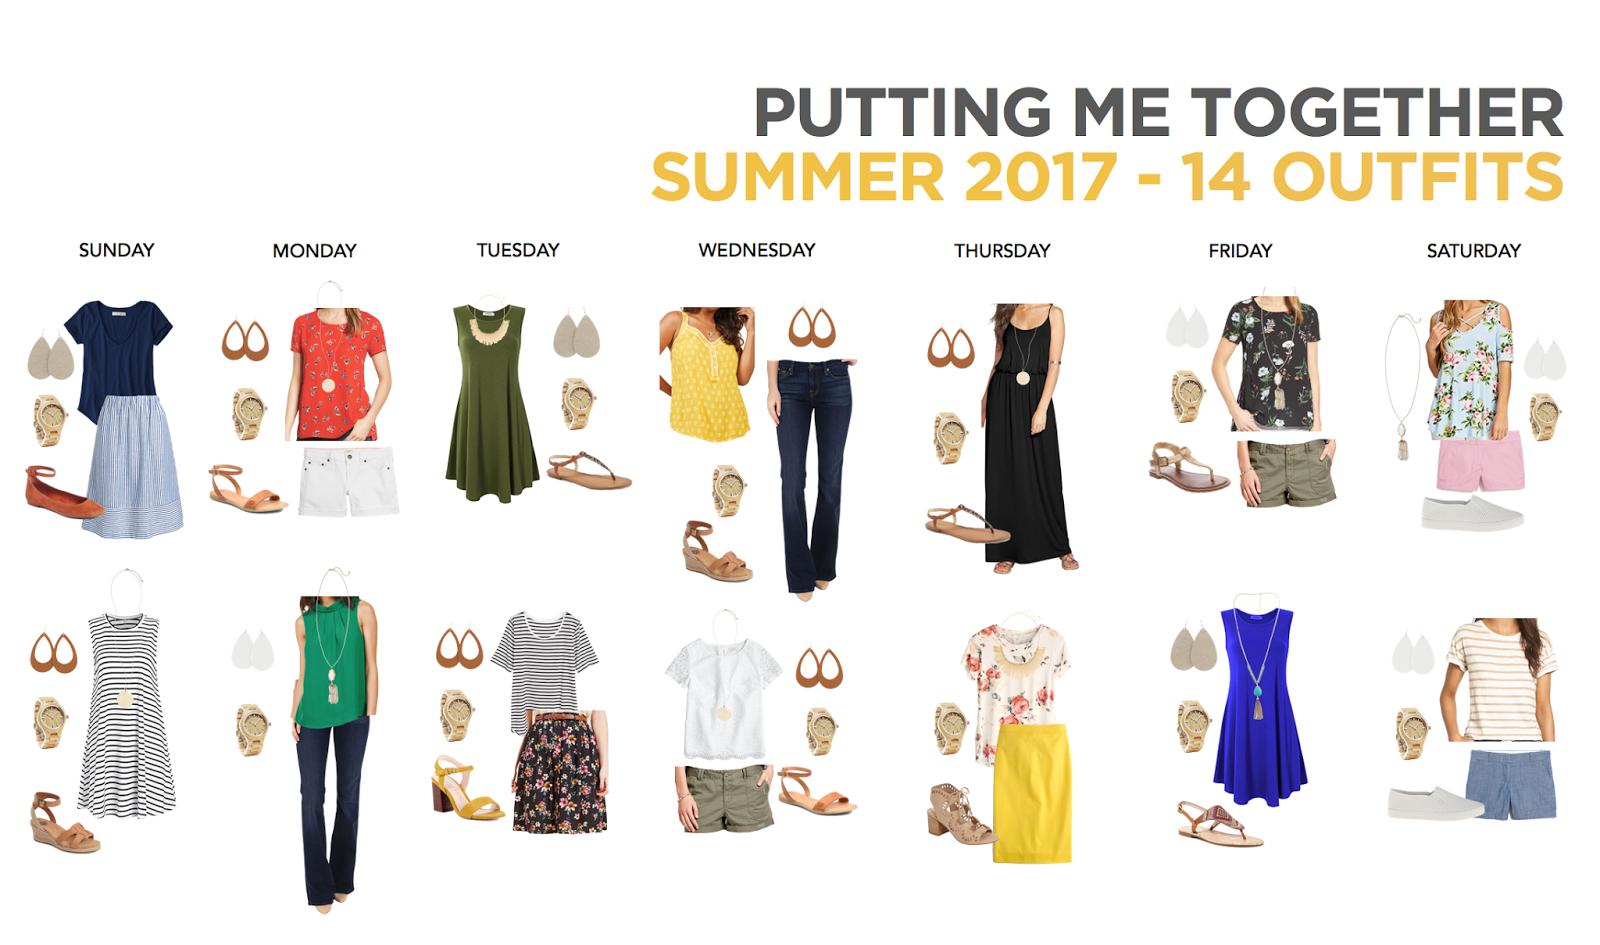 14 Cute Summer Outfit Ideas